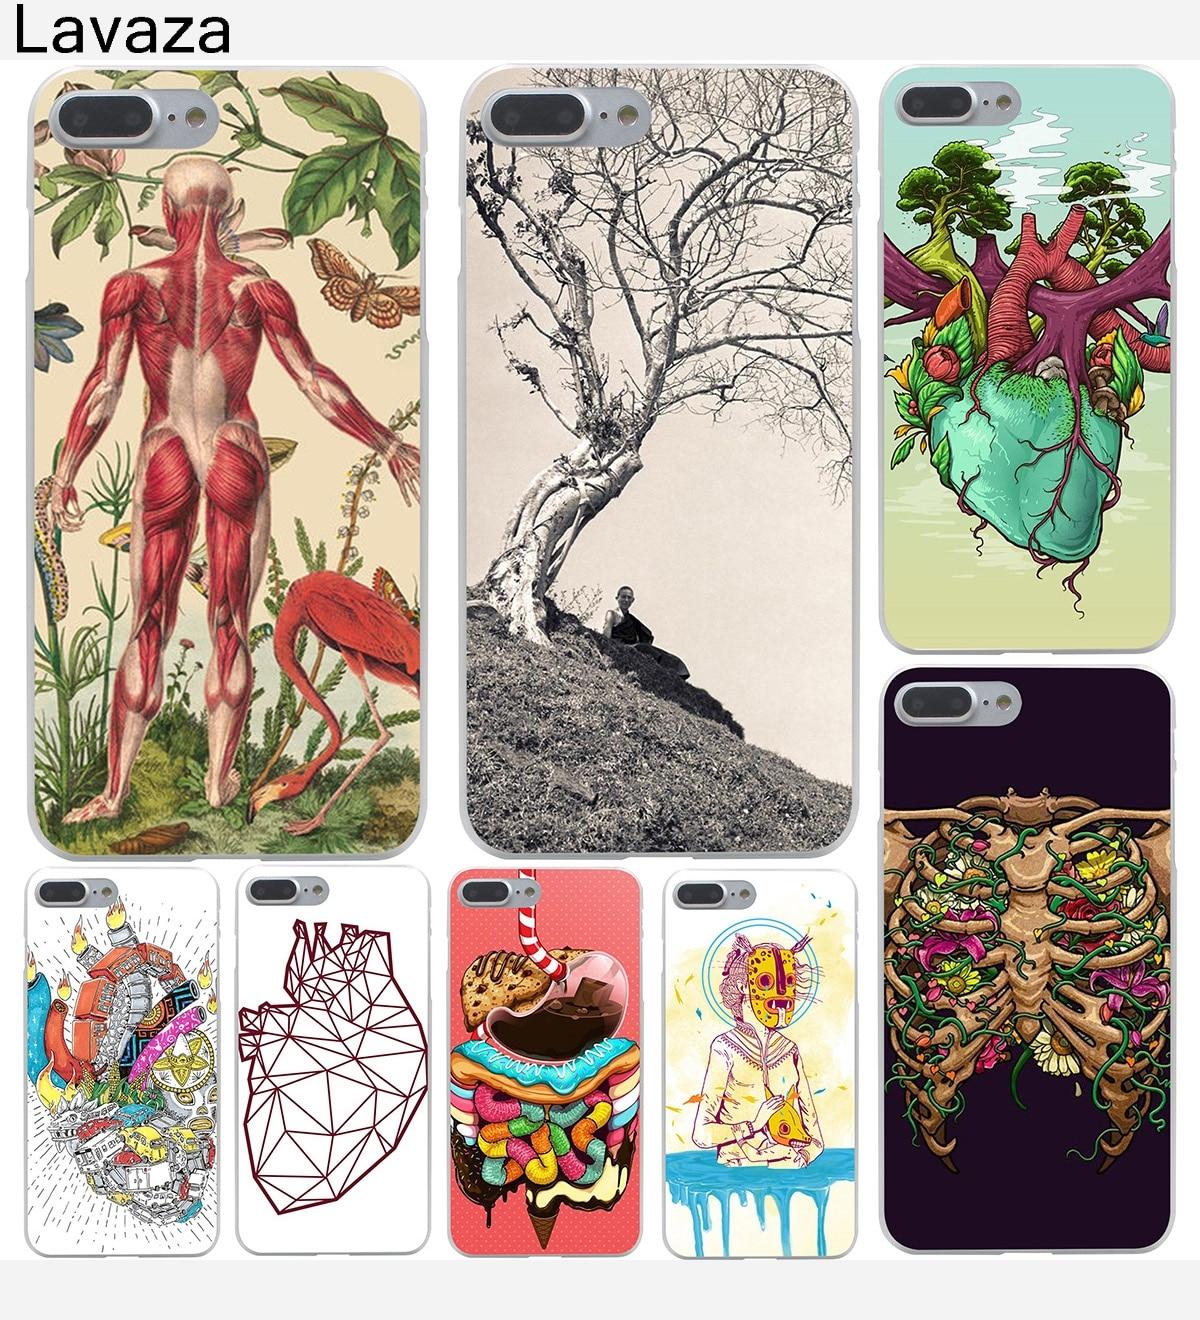 CASE DESIGNS HUMAN ANATOMY Hard Transparent Cover Case for iPhone 8 8 plus 7 7 Plus X, 10 6 6s Plus 5 5S SE 5c 4 4S